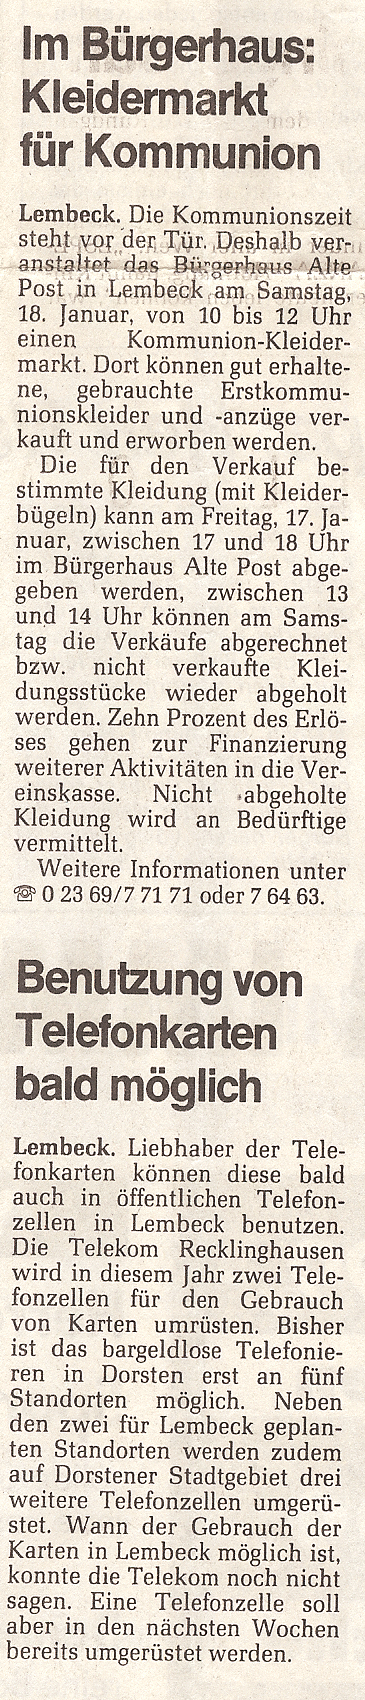 19920111_Stadtspiegel_Lembeck_03